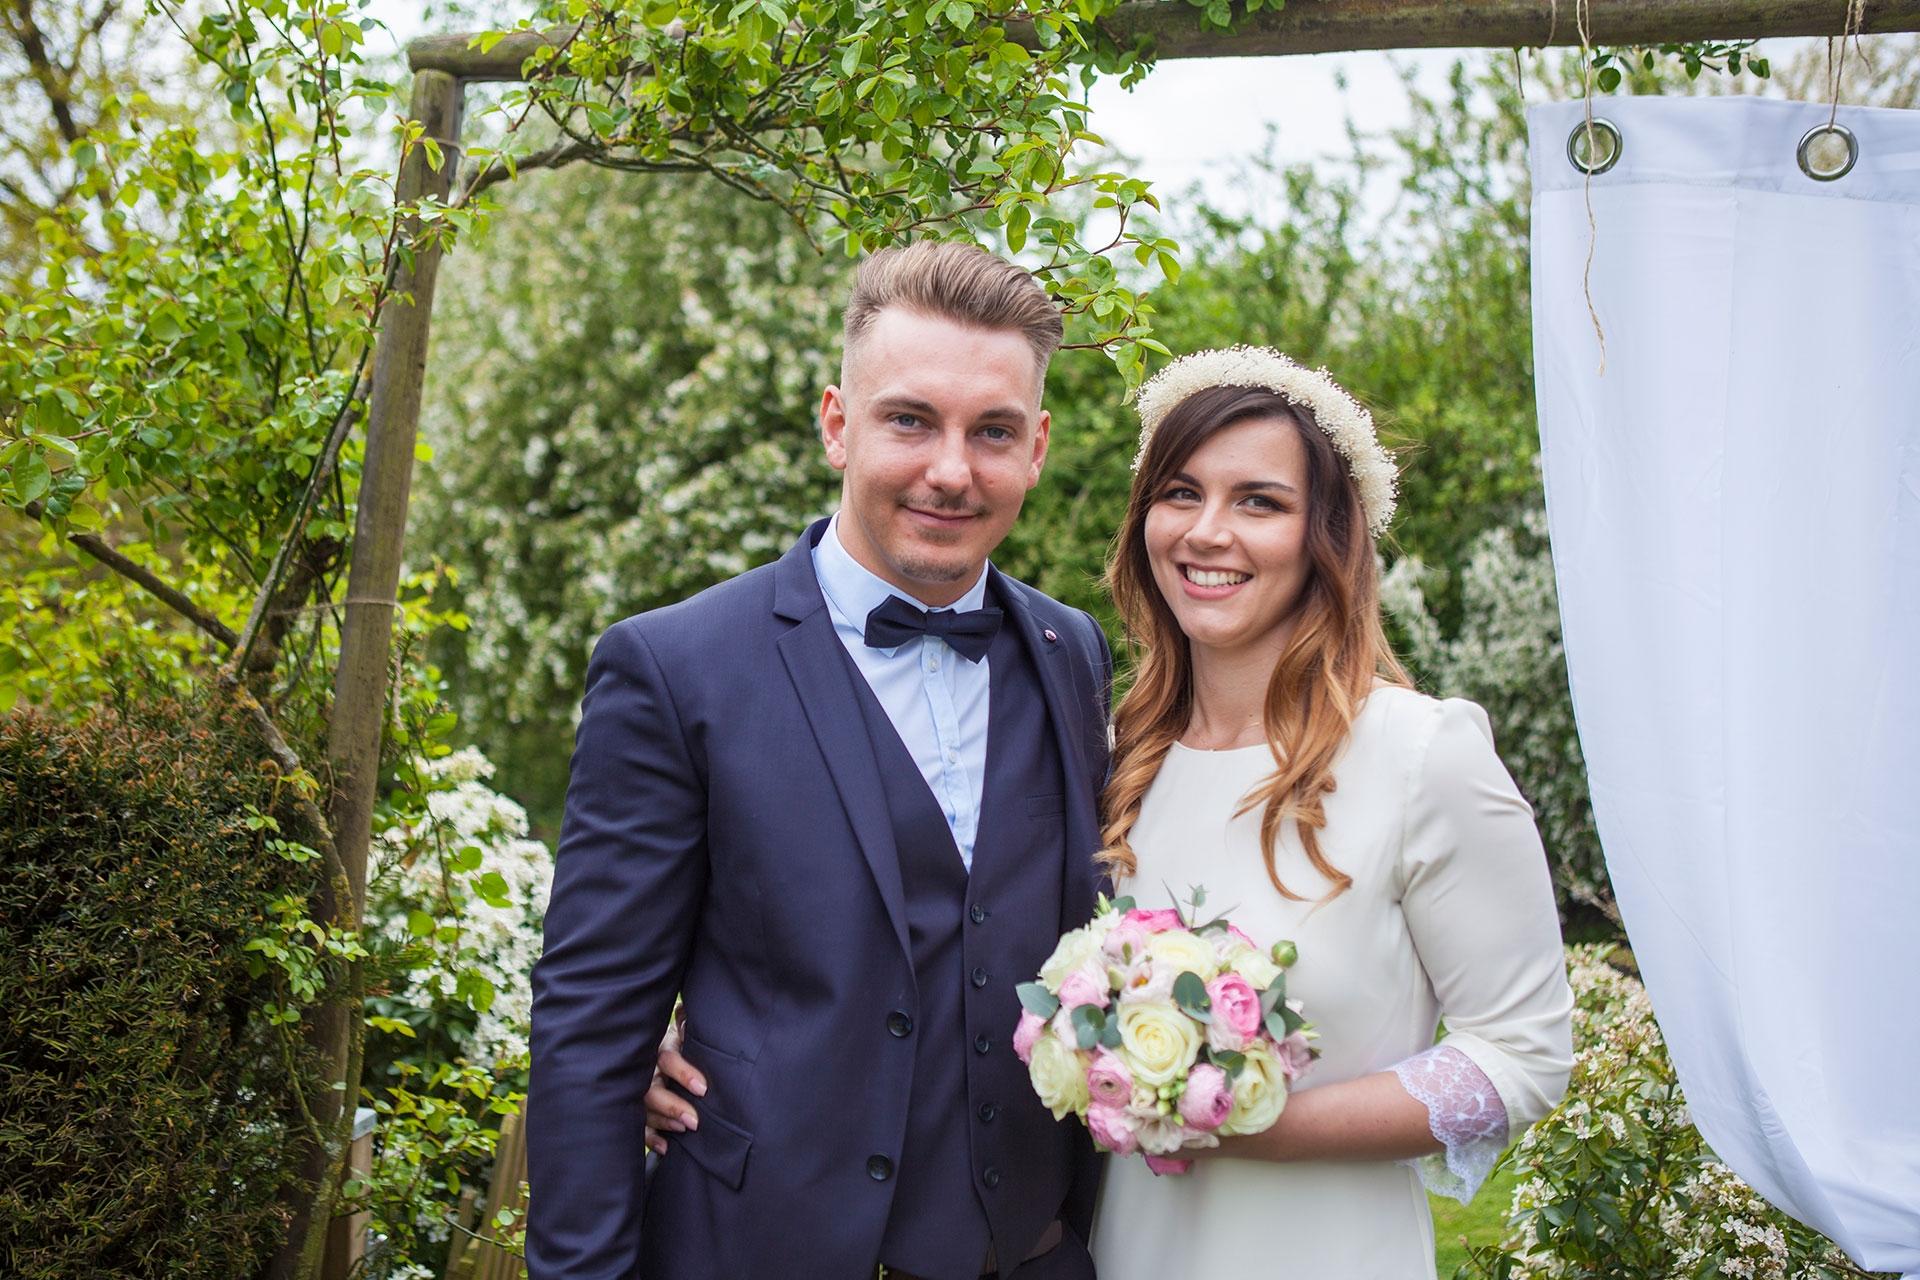 particuliers-evenements-mariages-oui-zelie&valentin-13